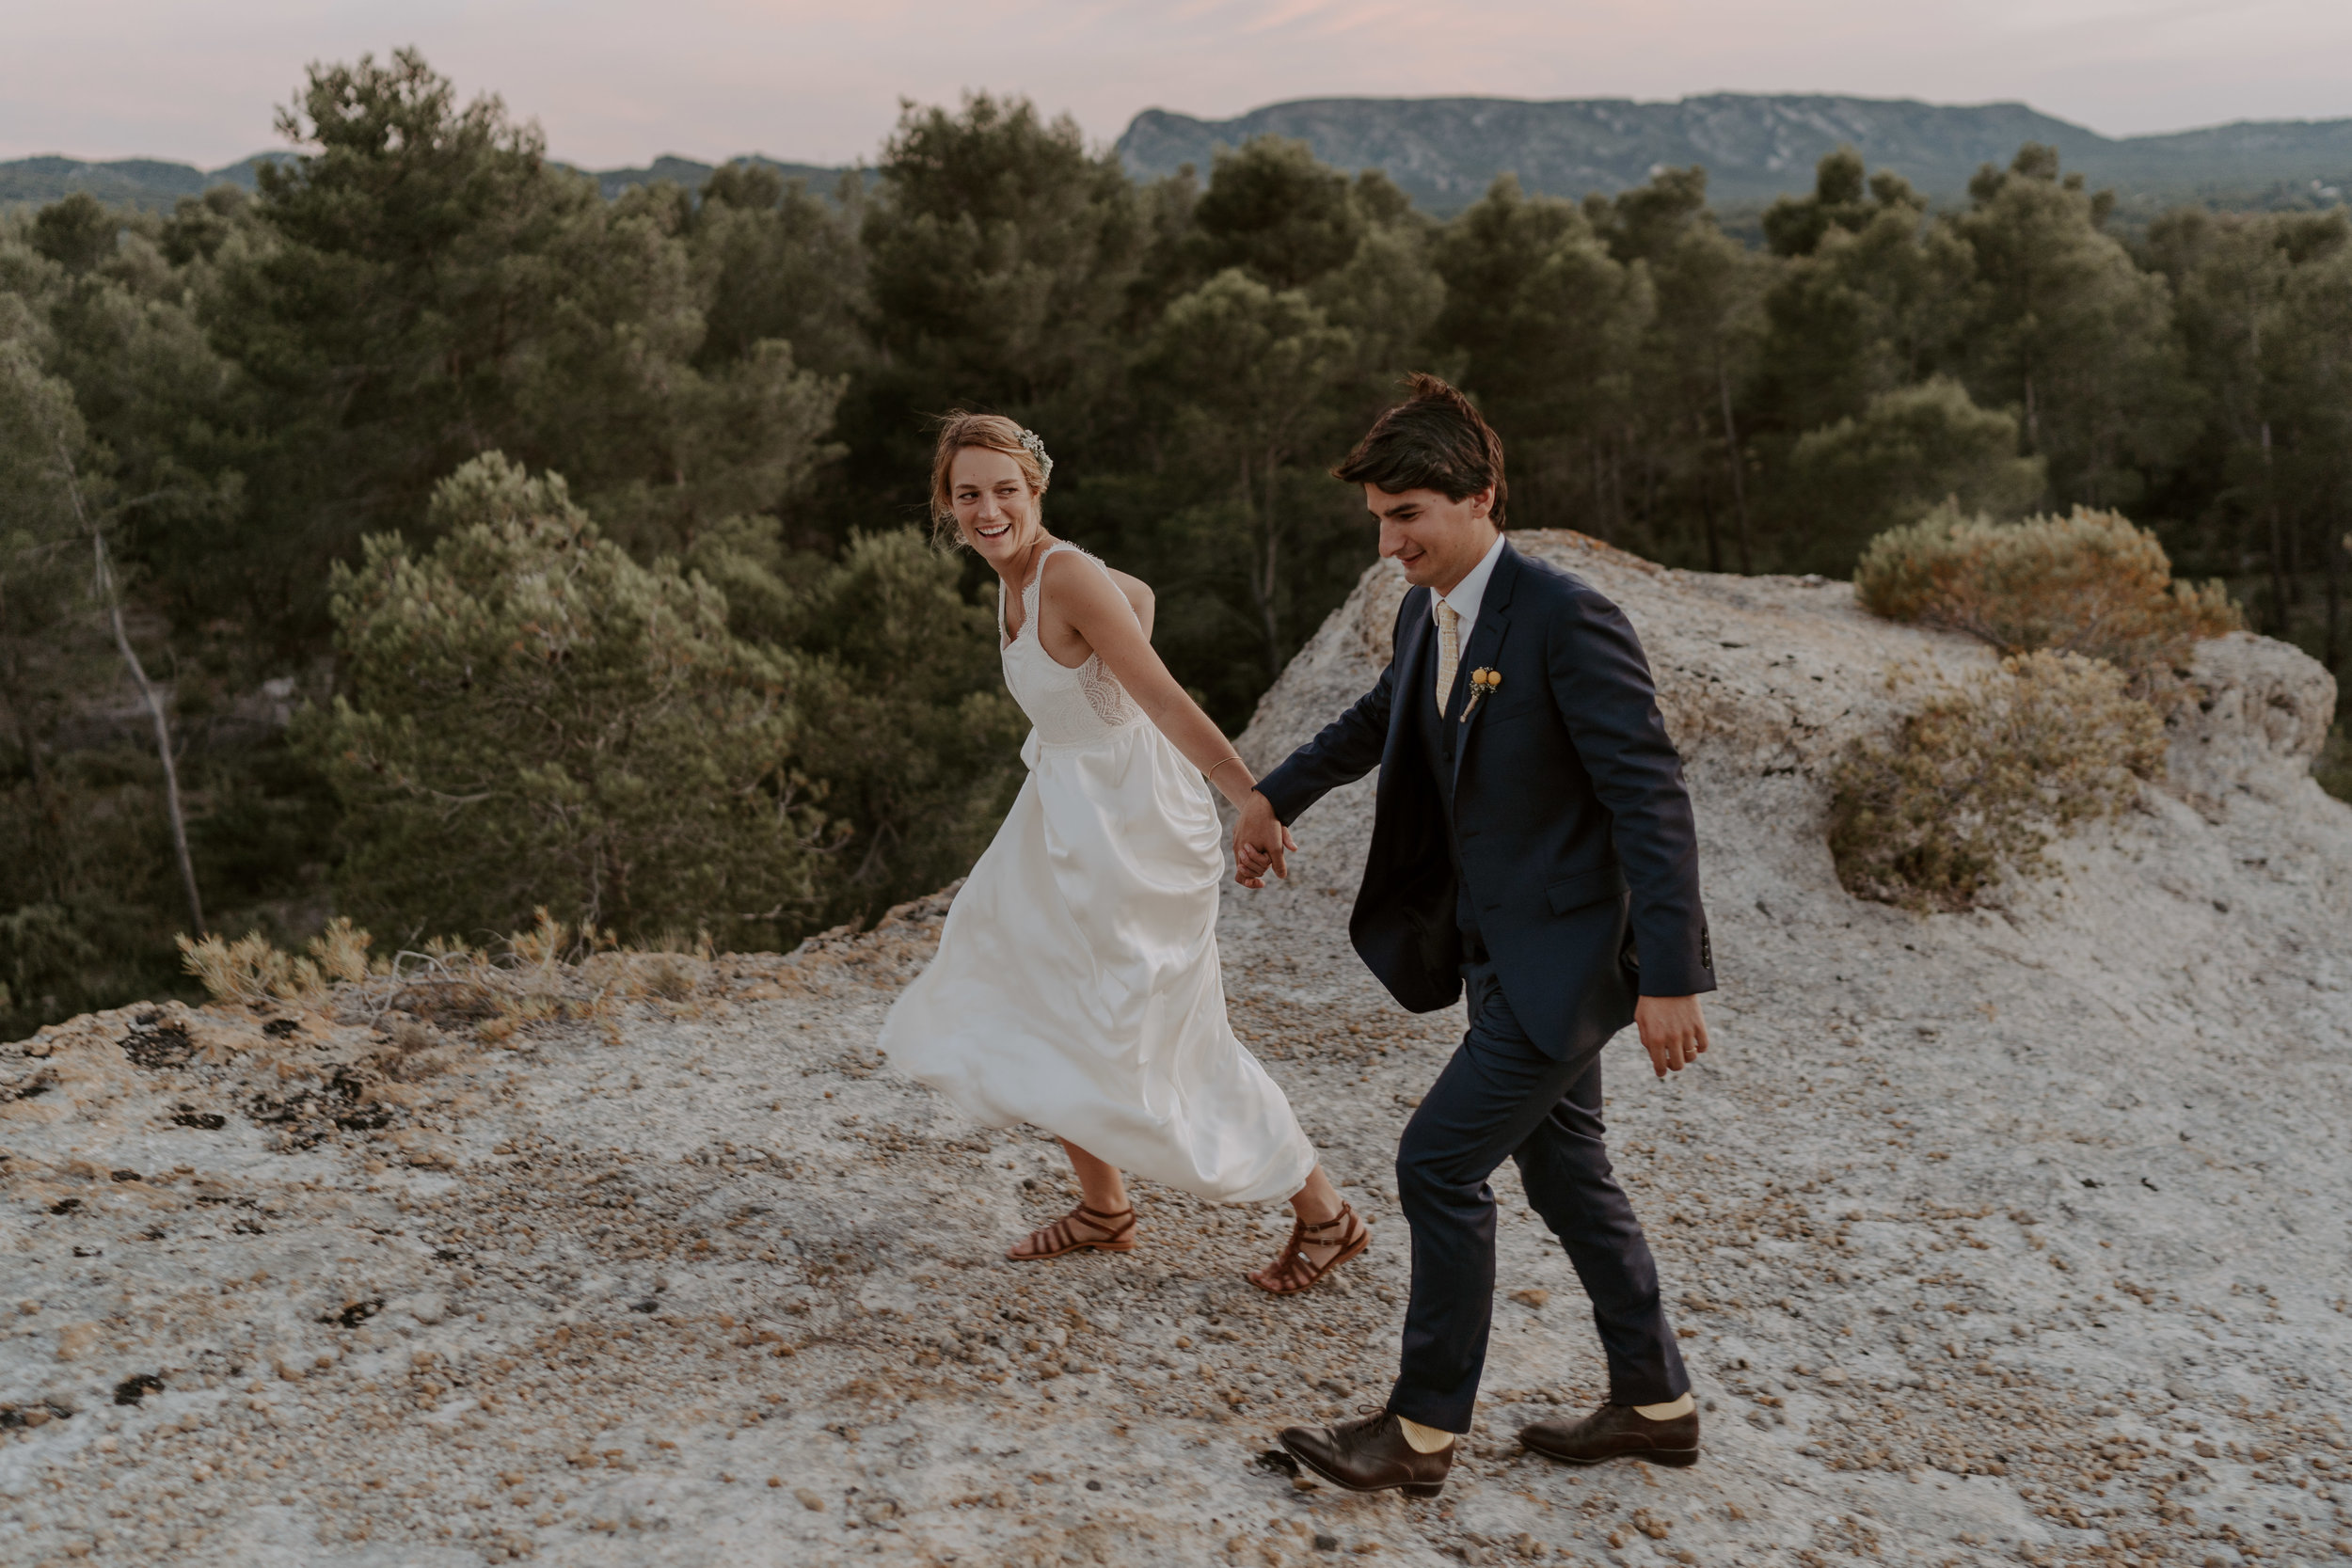 elsacaza_photographe_mariage_Juliette_Nicolas-1075.jpg